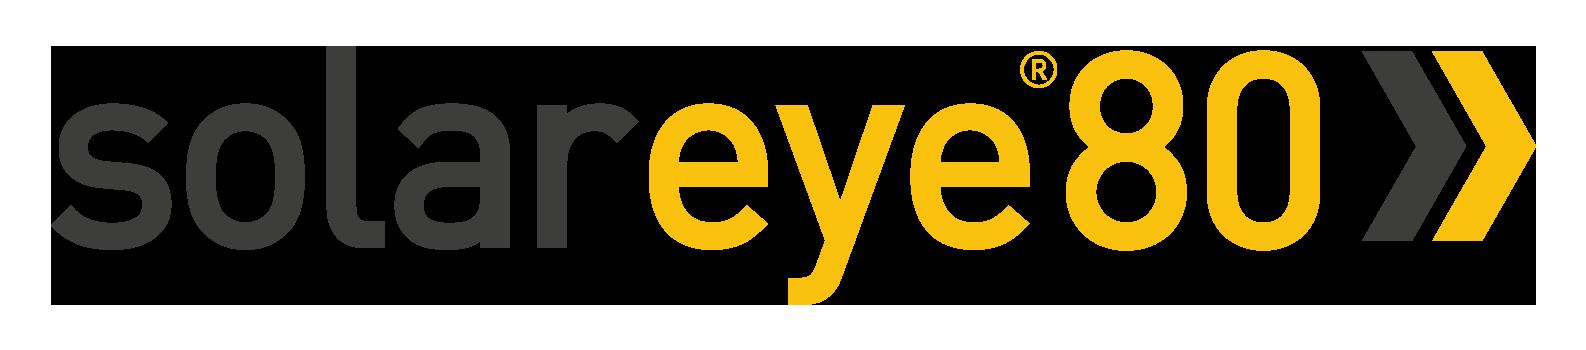 Solareye®80 Logo | Surface Designs is the Australian Distributor for Solareye®80